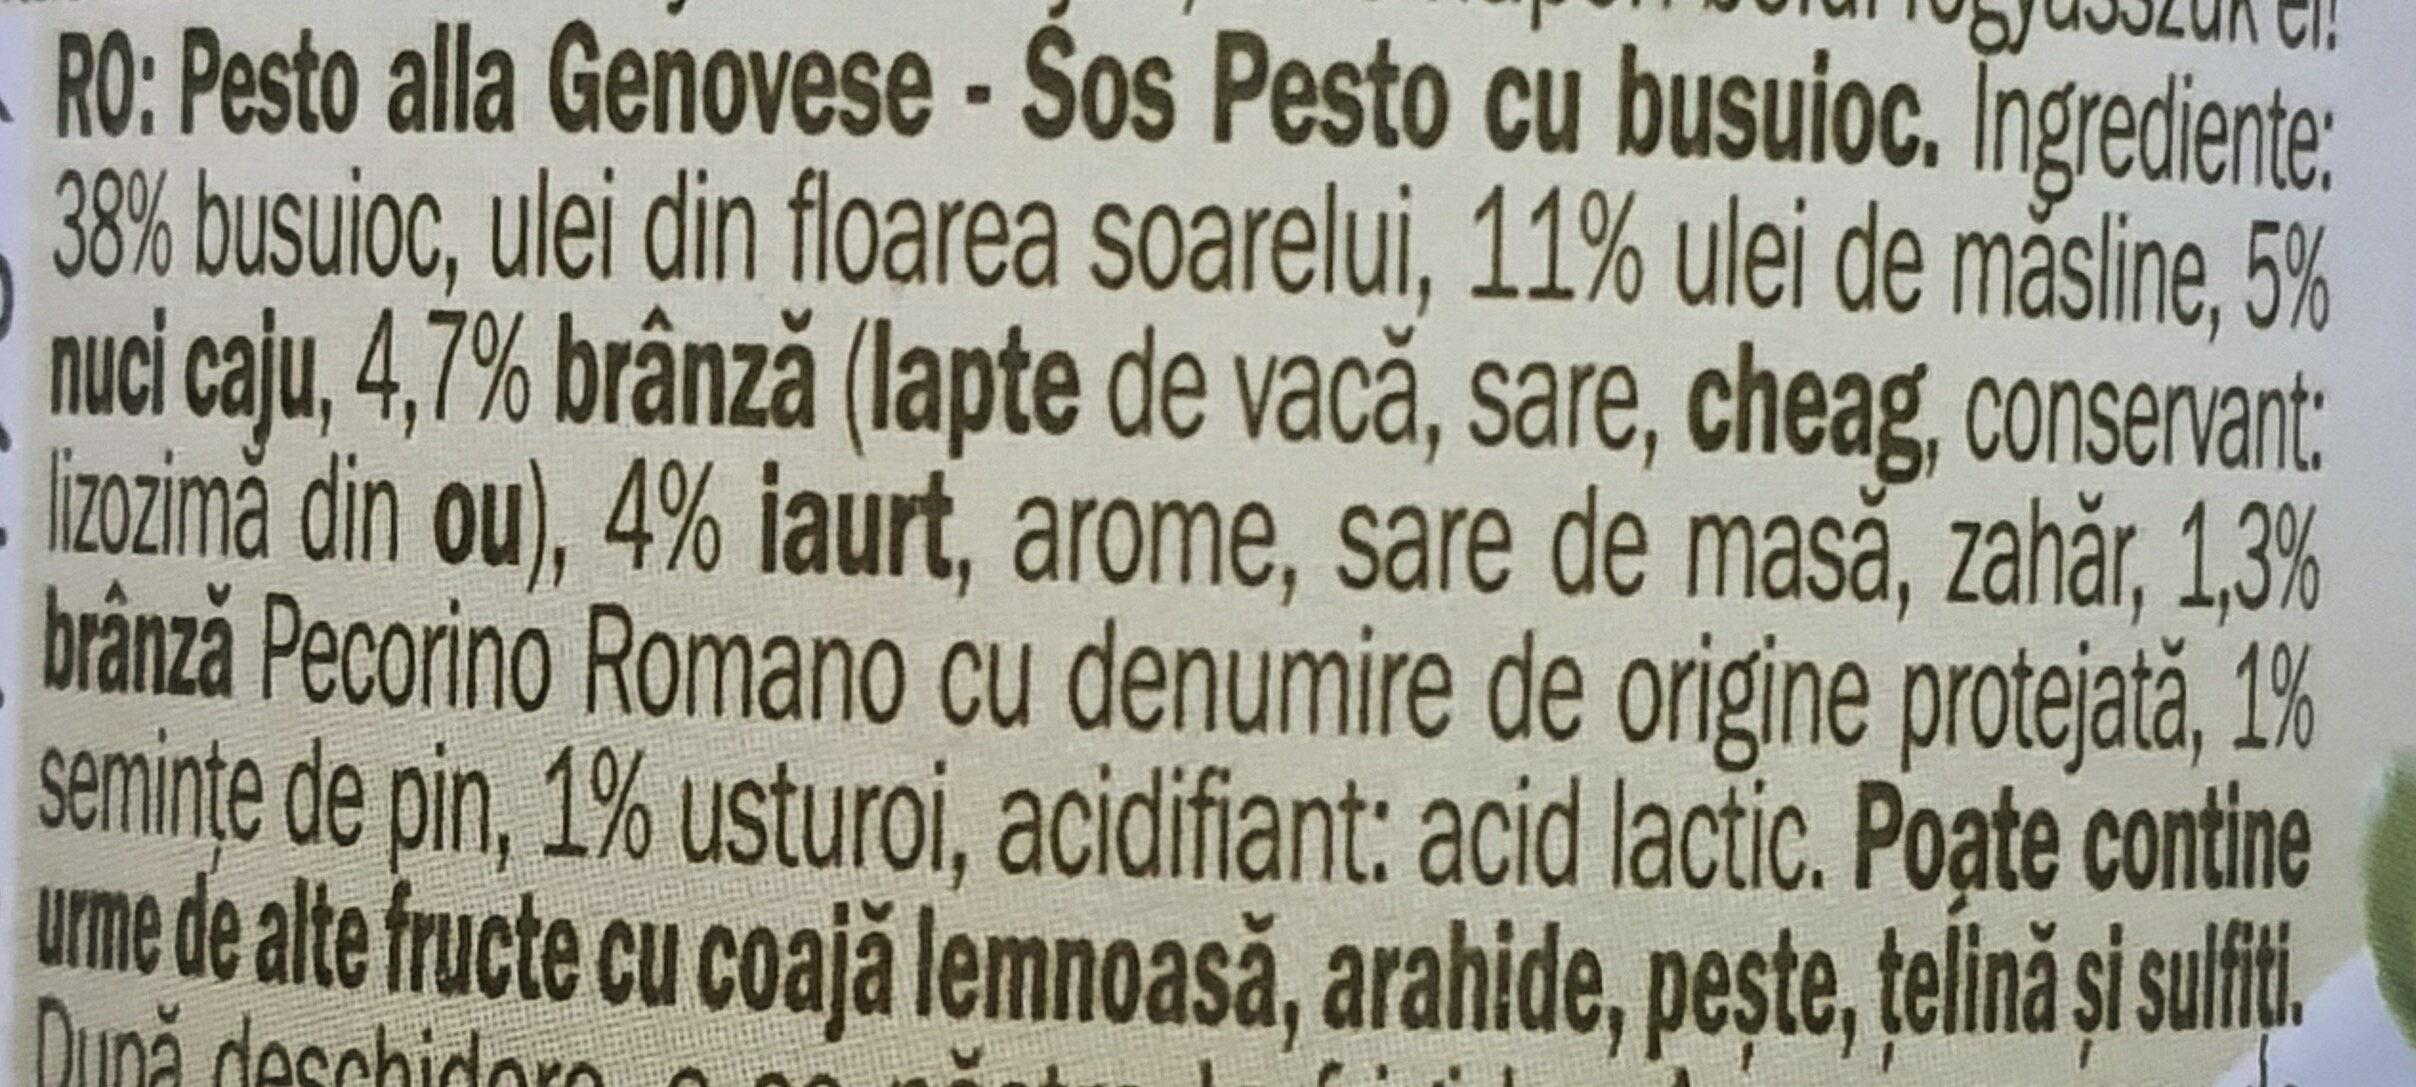 Pesto allá genovese - Ingrediënten - en